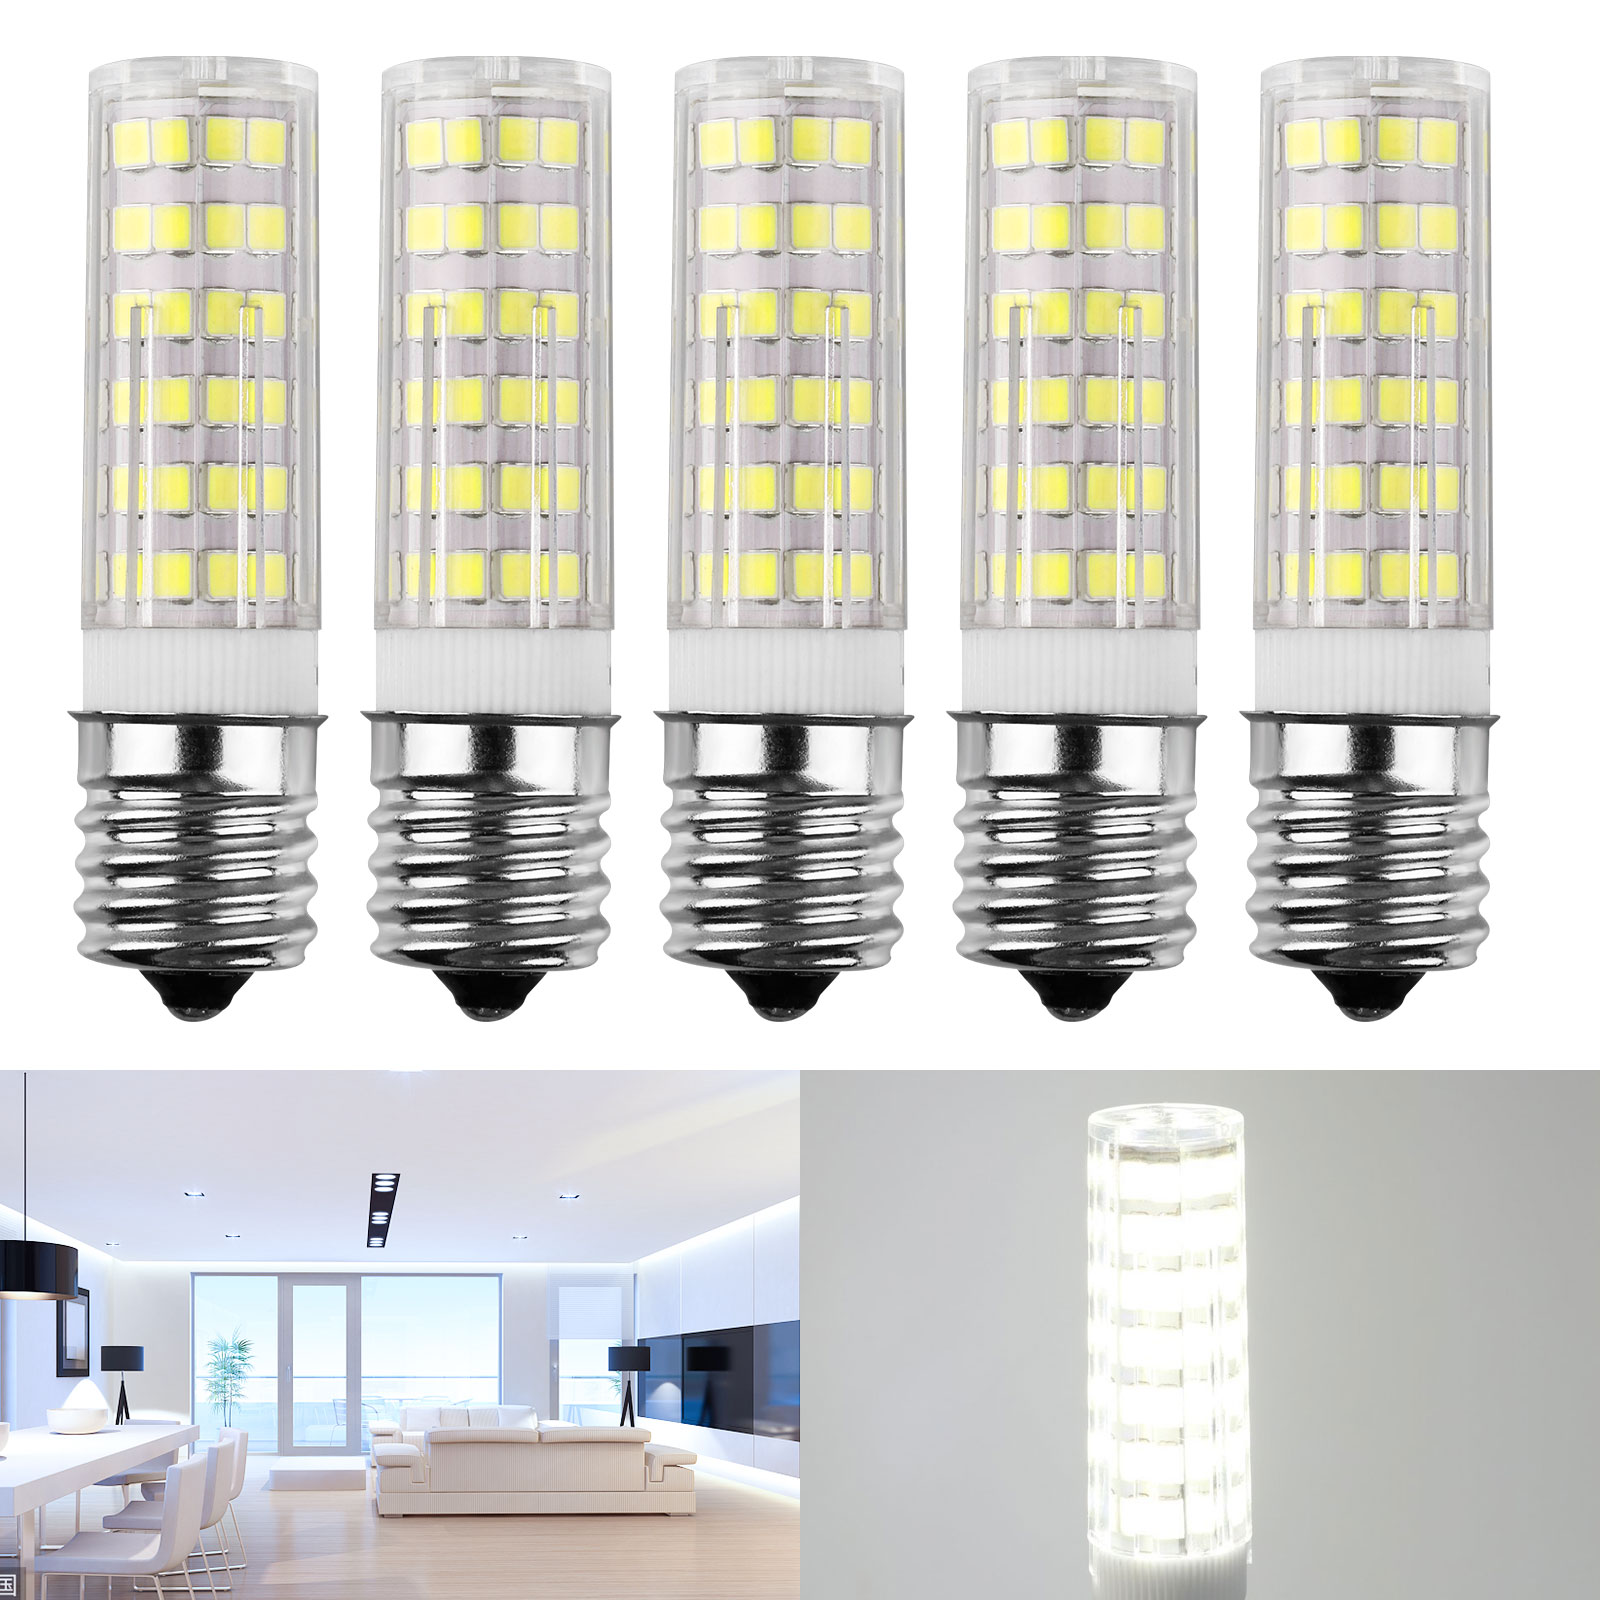 E17-LED-Dimmable-Intermediate-Base-Microwave-7W-Appliance-Light-Bulb-5-Pack thumbnail 9